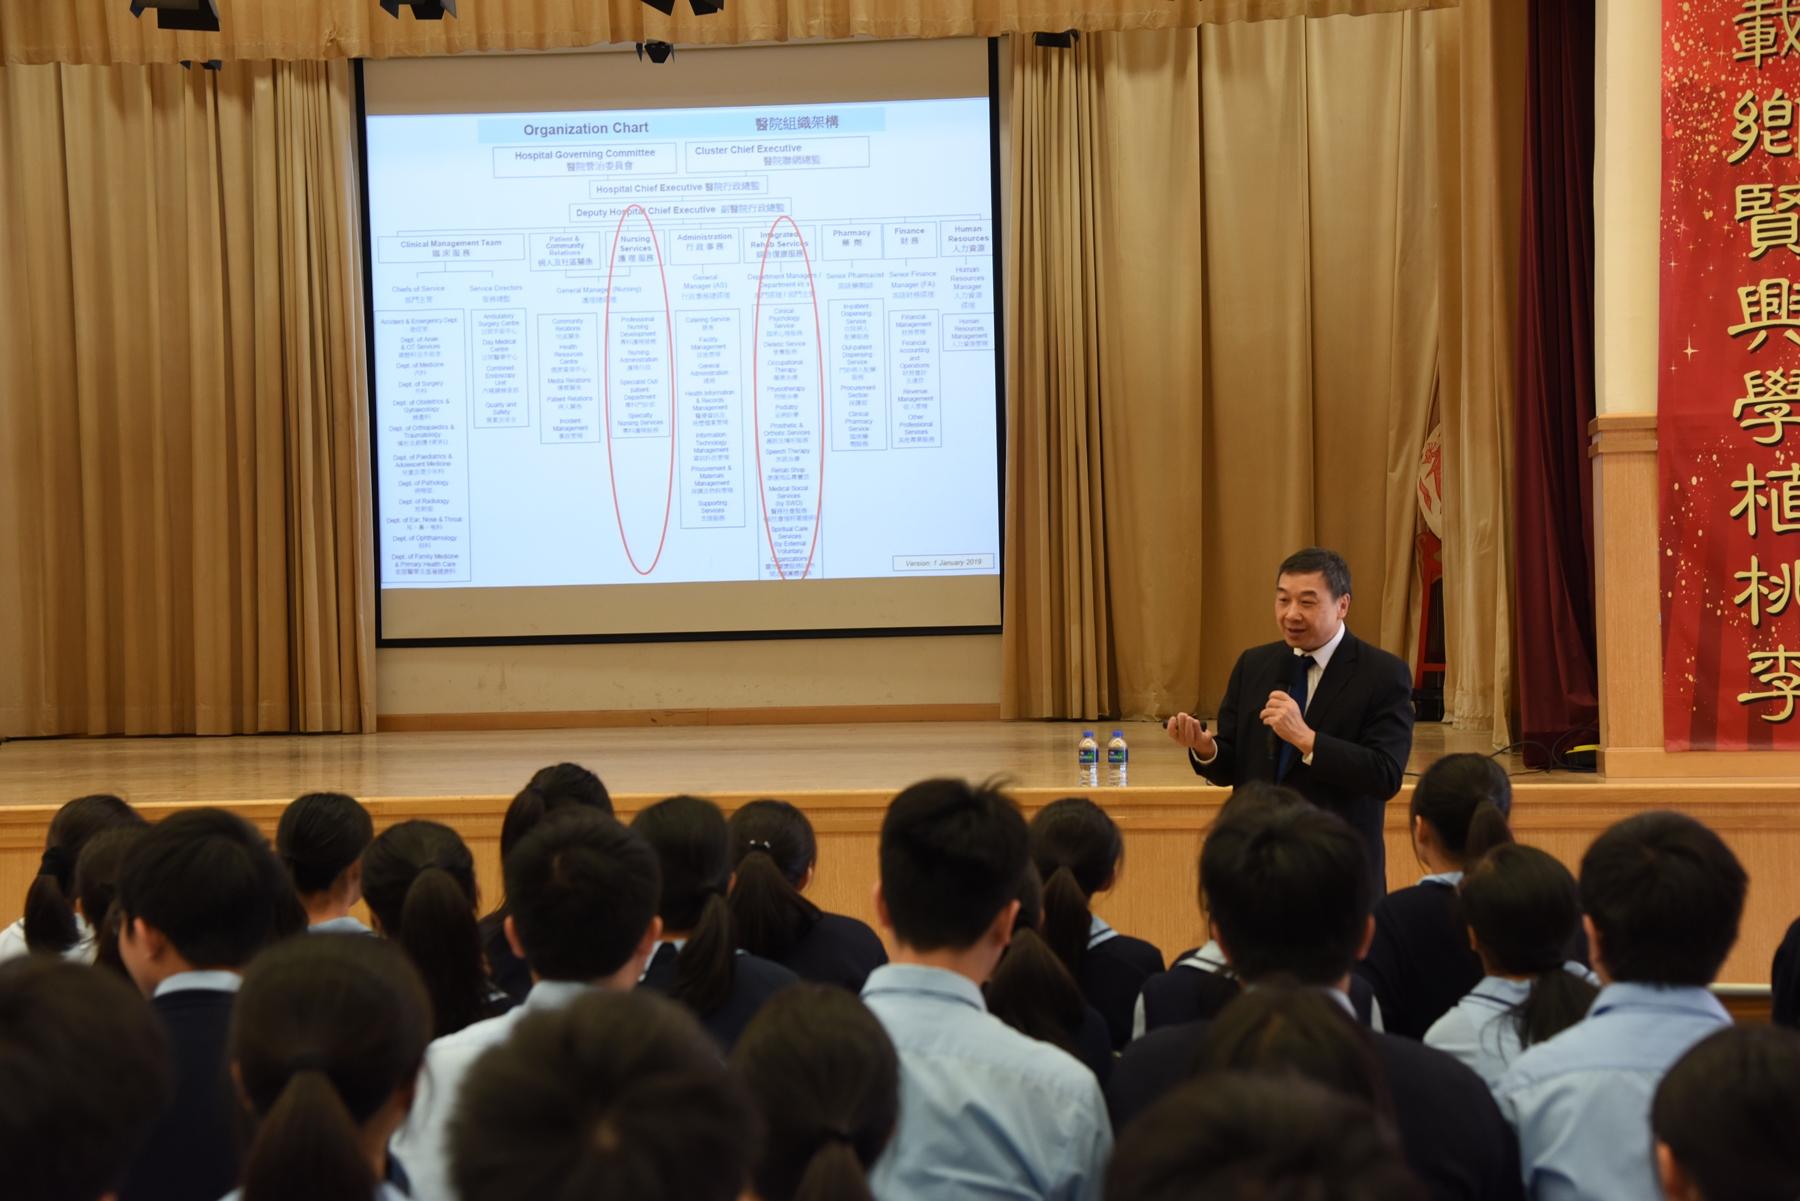 http://npc.edu.hk/sites/default/files/dsc_2490.jpg